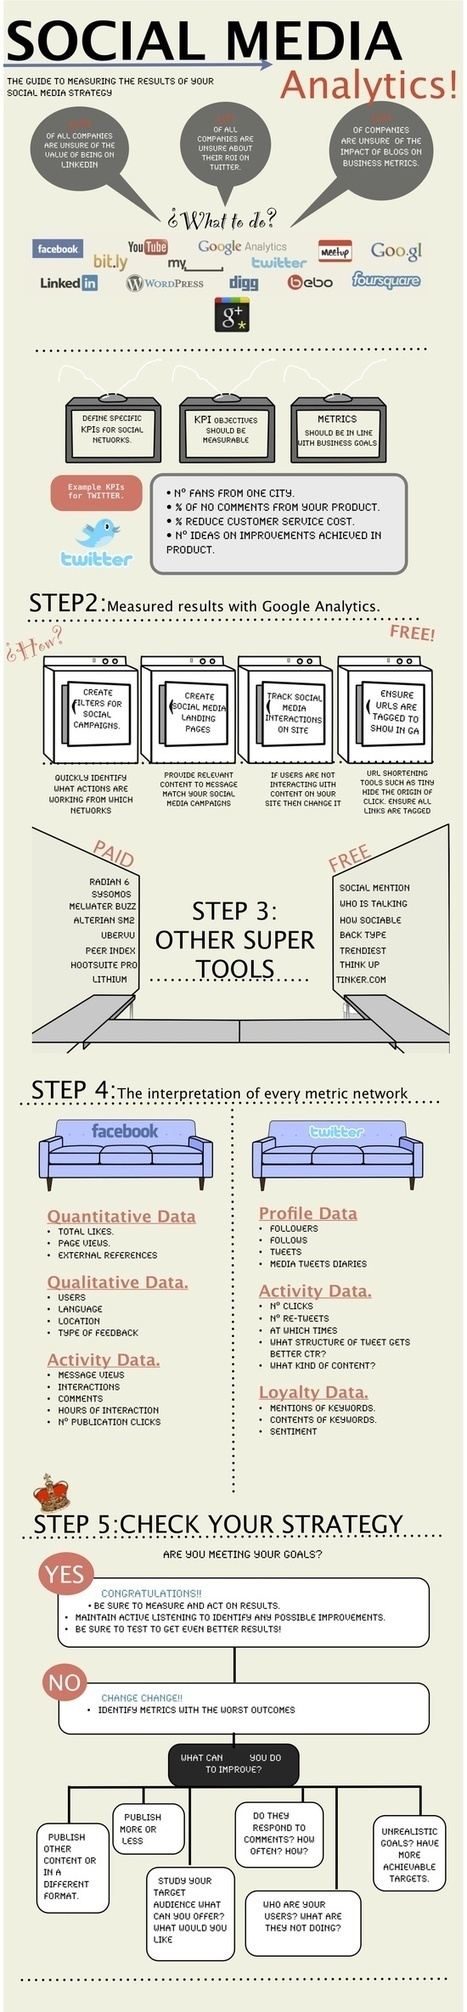 Socialmedia Analitics | Data Analyst | Scoop.it